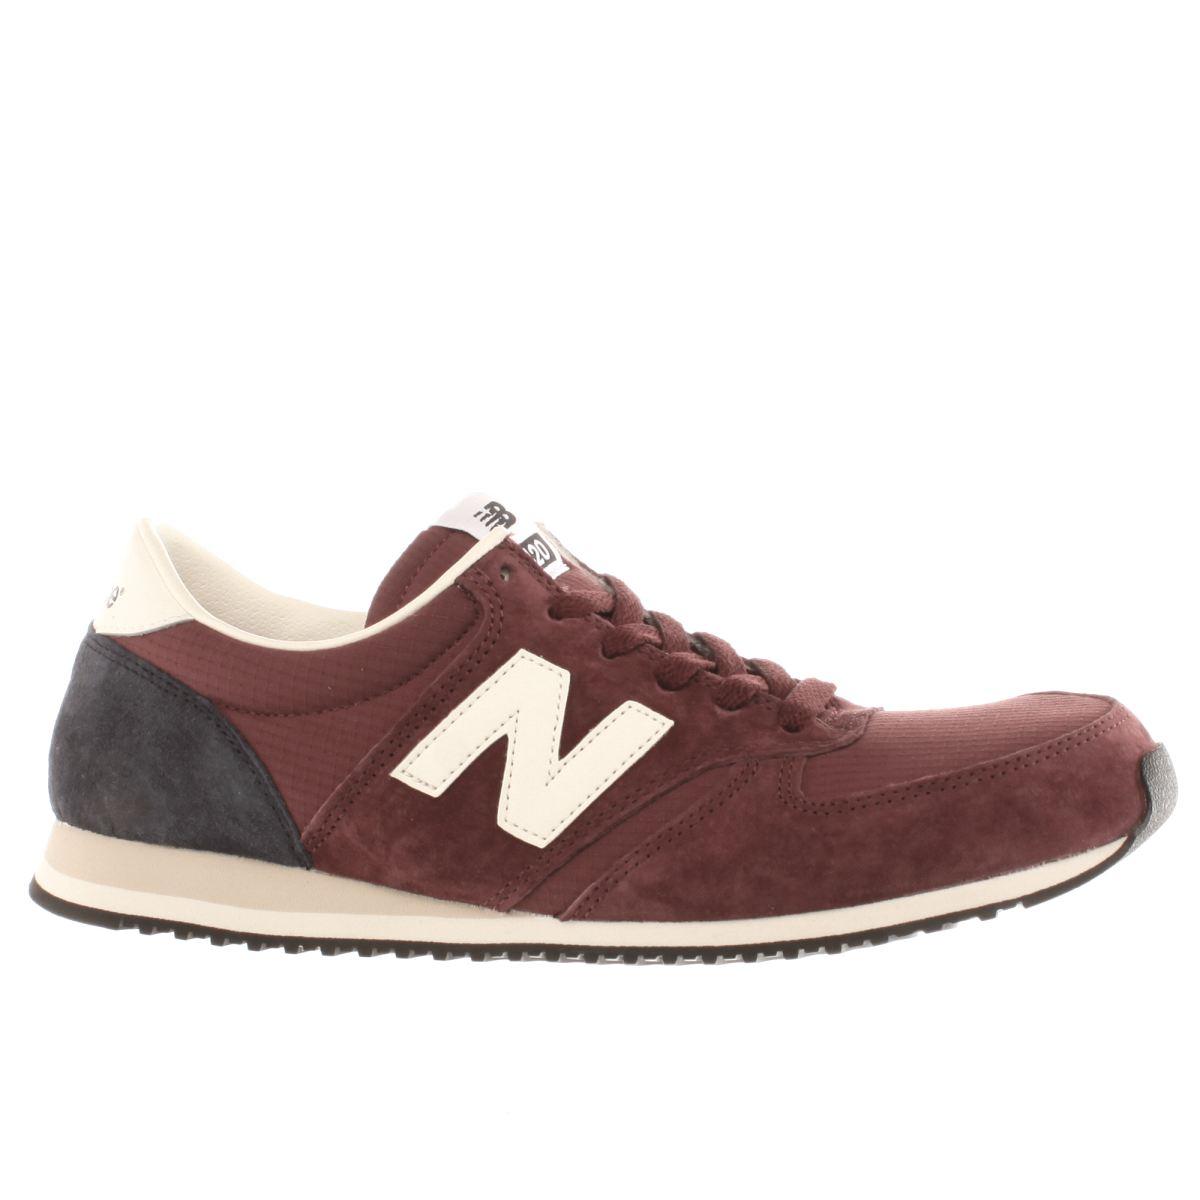 new balance burgundy 420 trainers